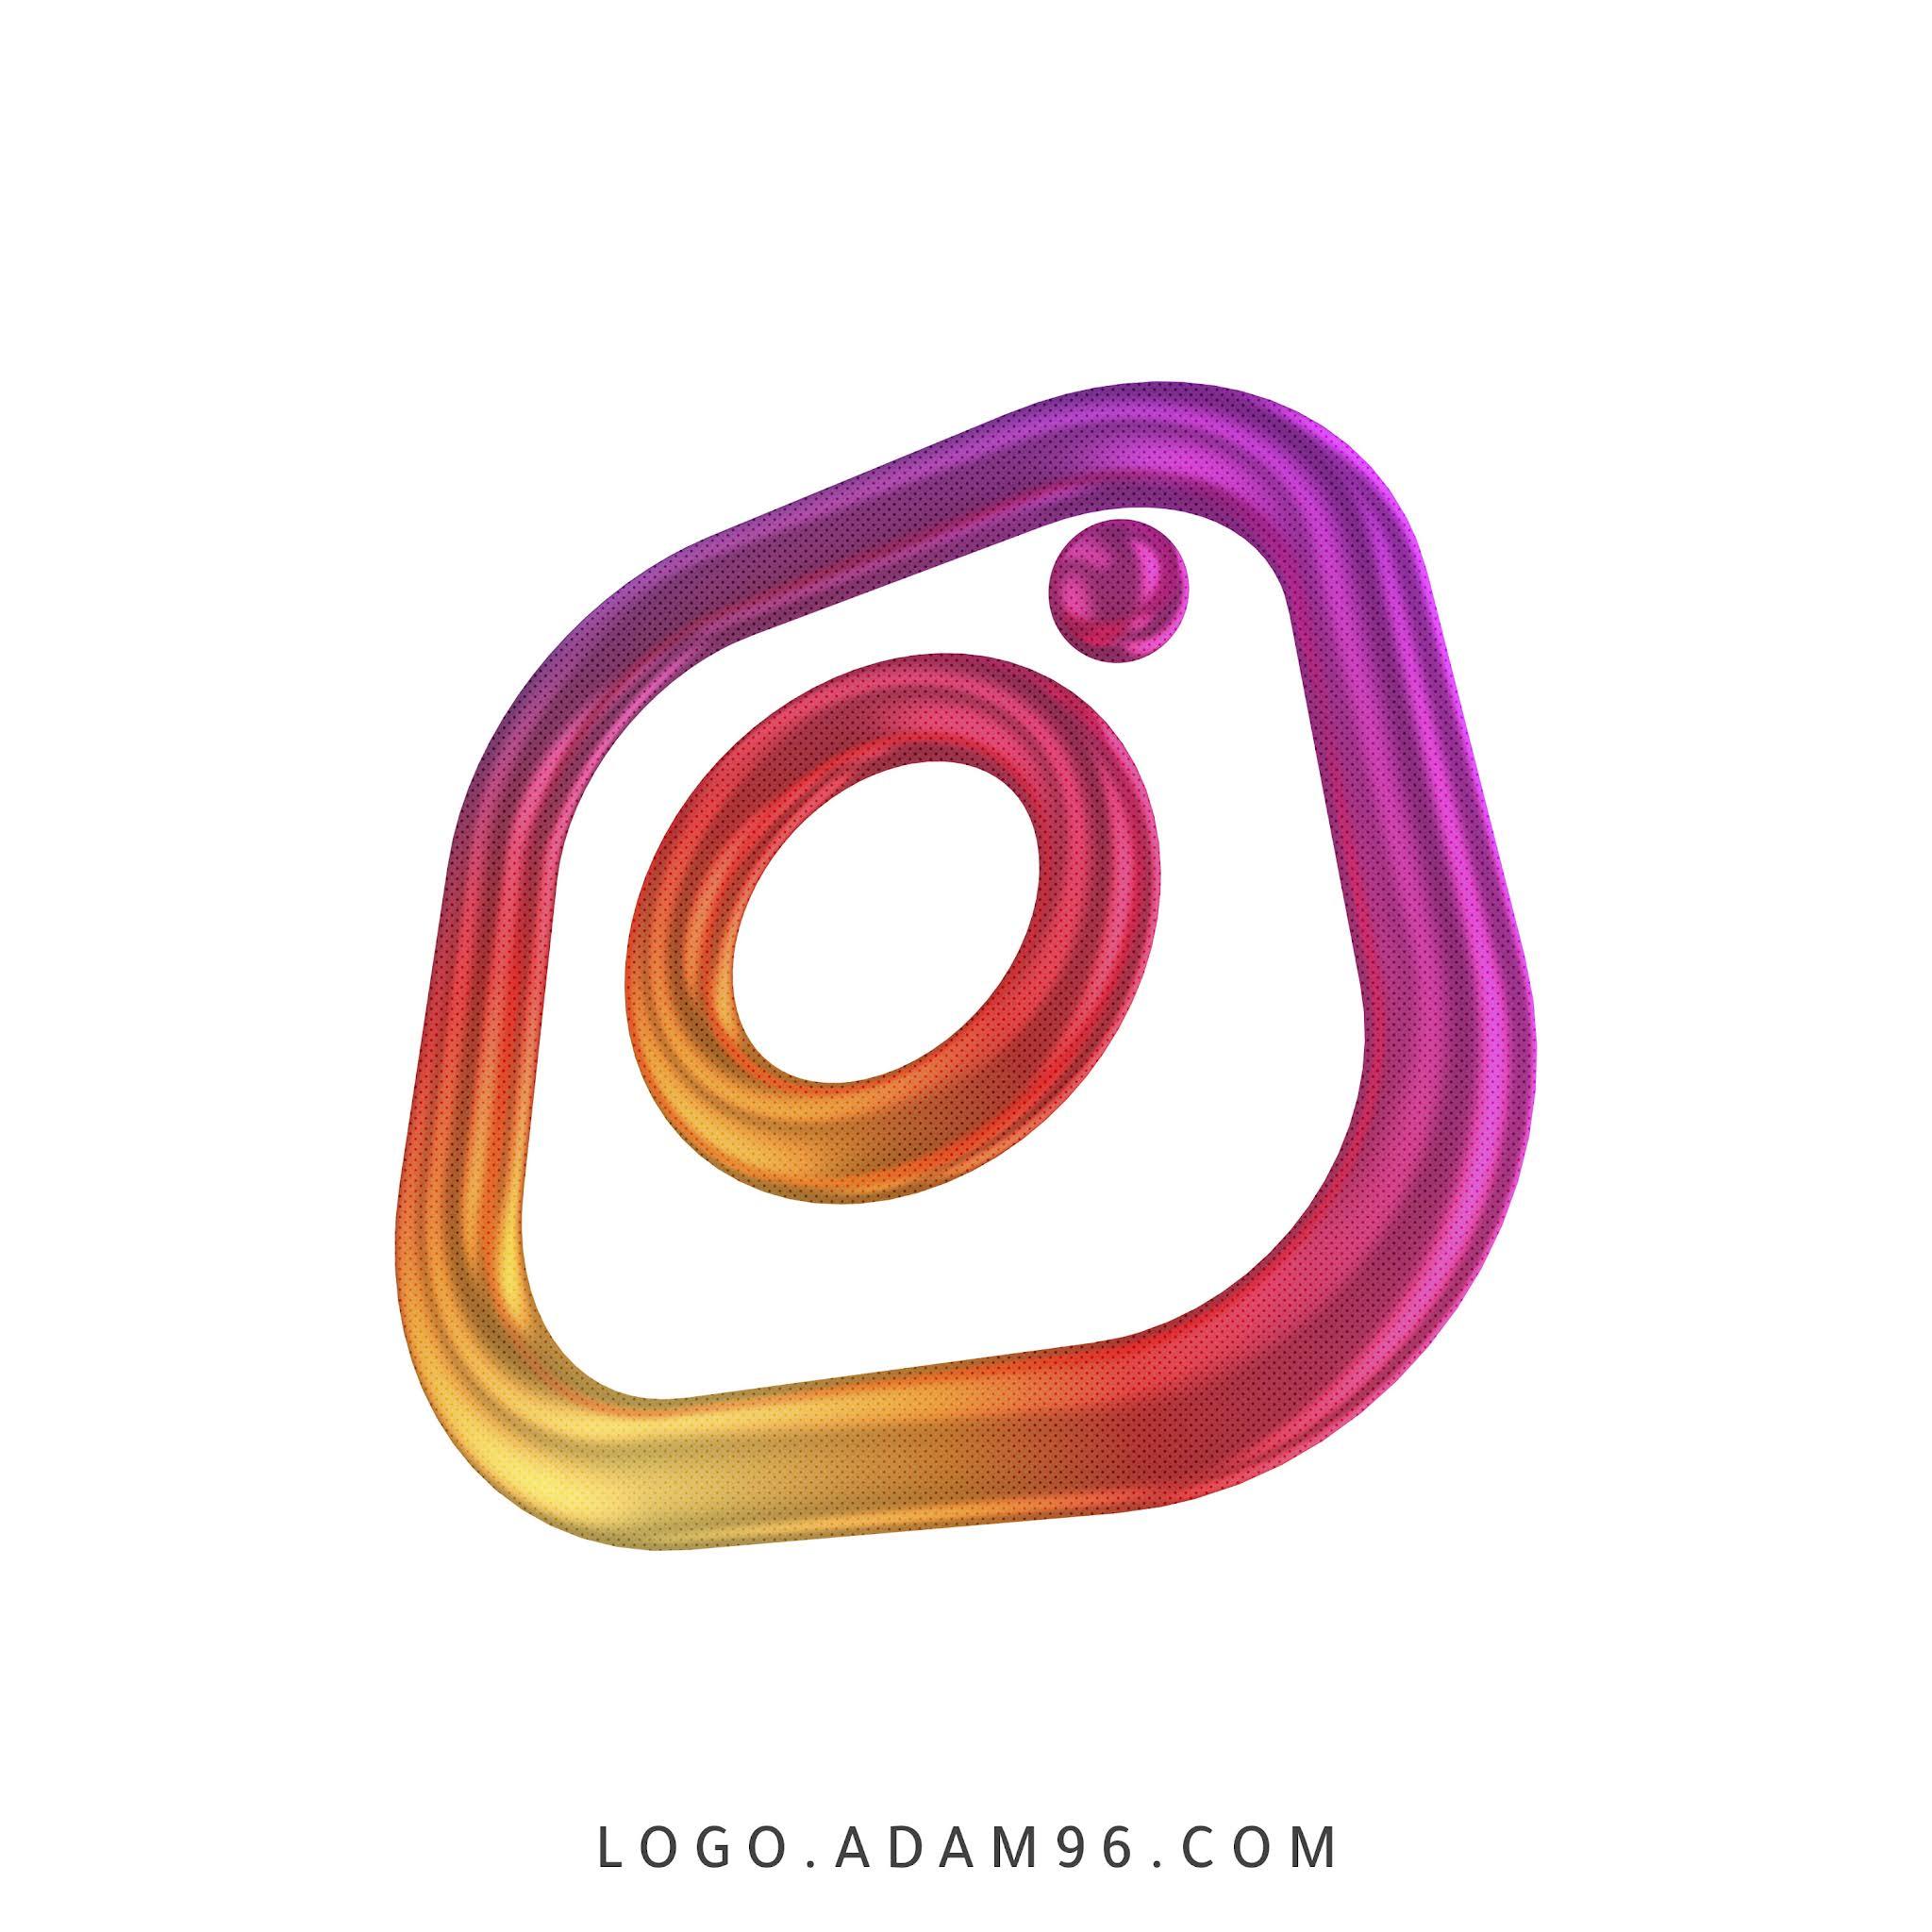 تحميل شعار الانستقرام ثري دي Logo Instagram 3d